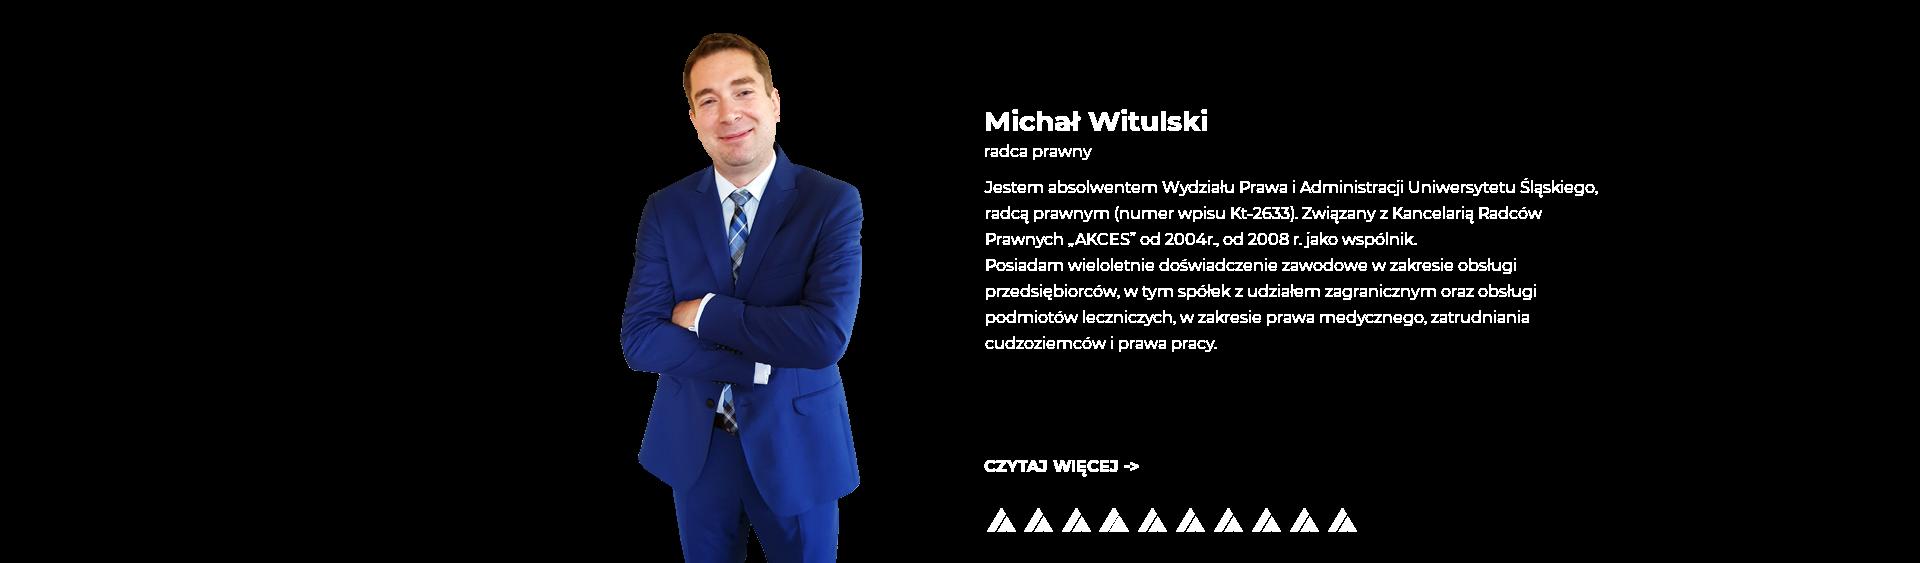 michalslidePL_2